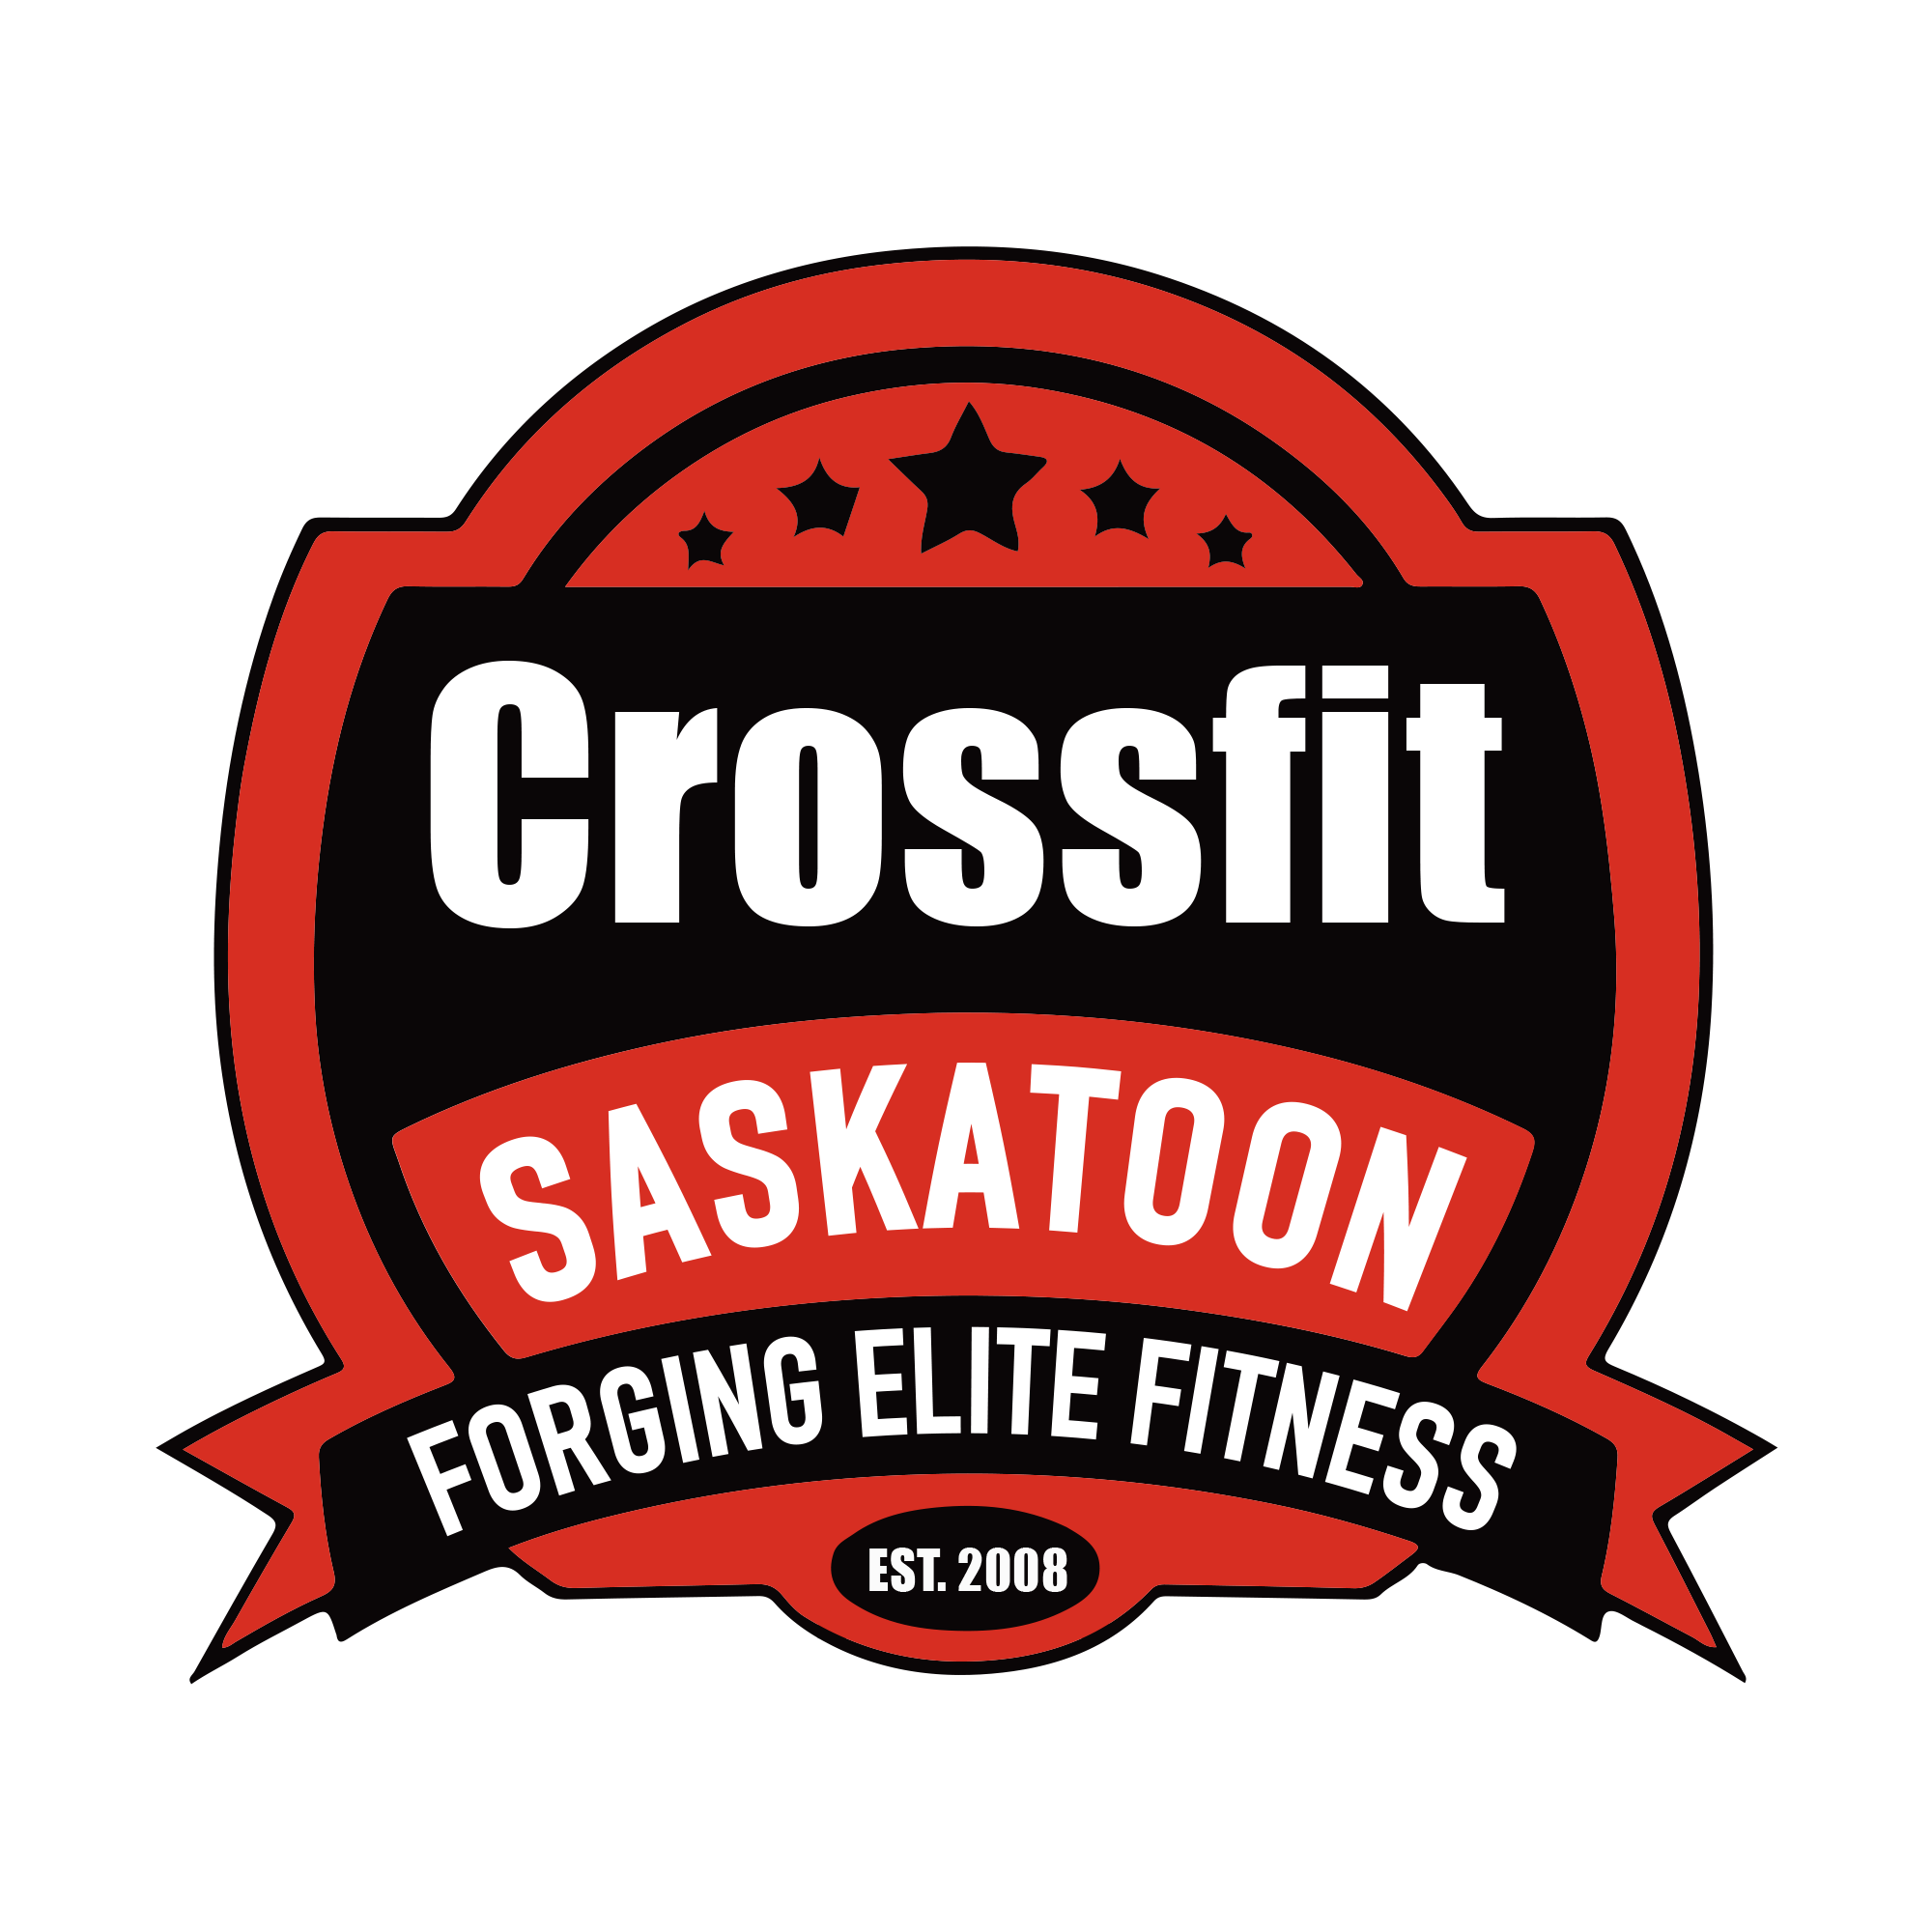 Crossfit_Saskatoon_Black.png